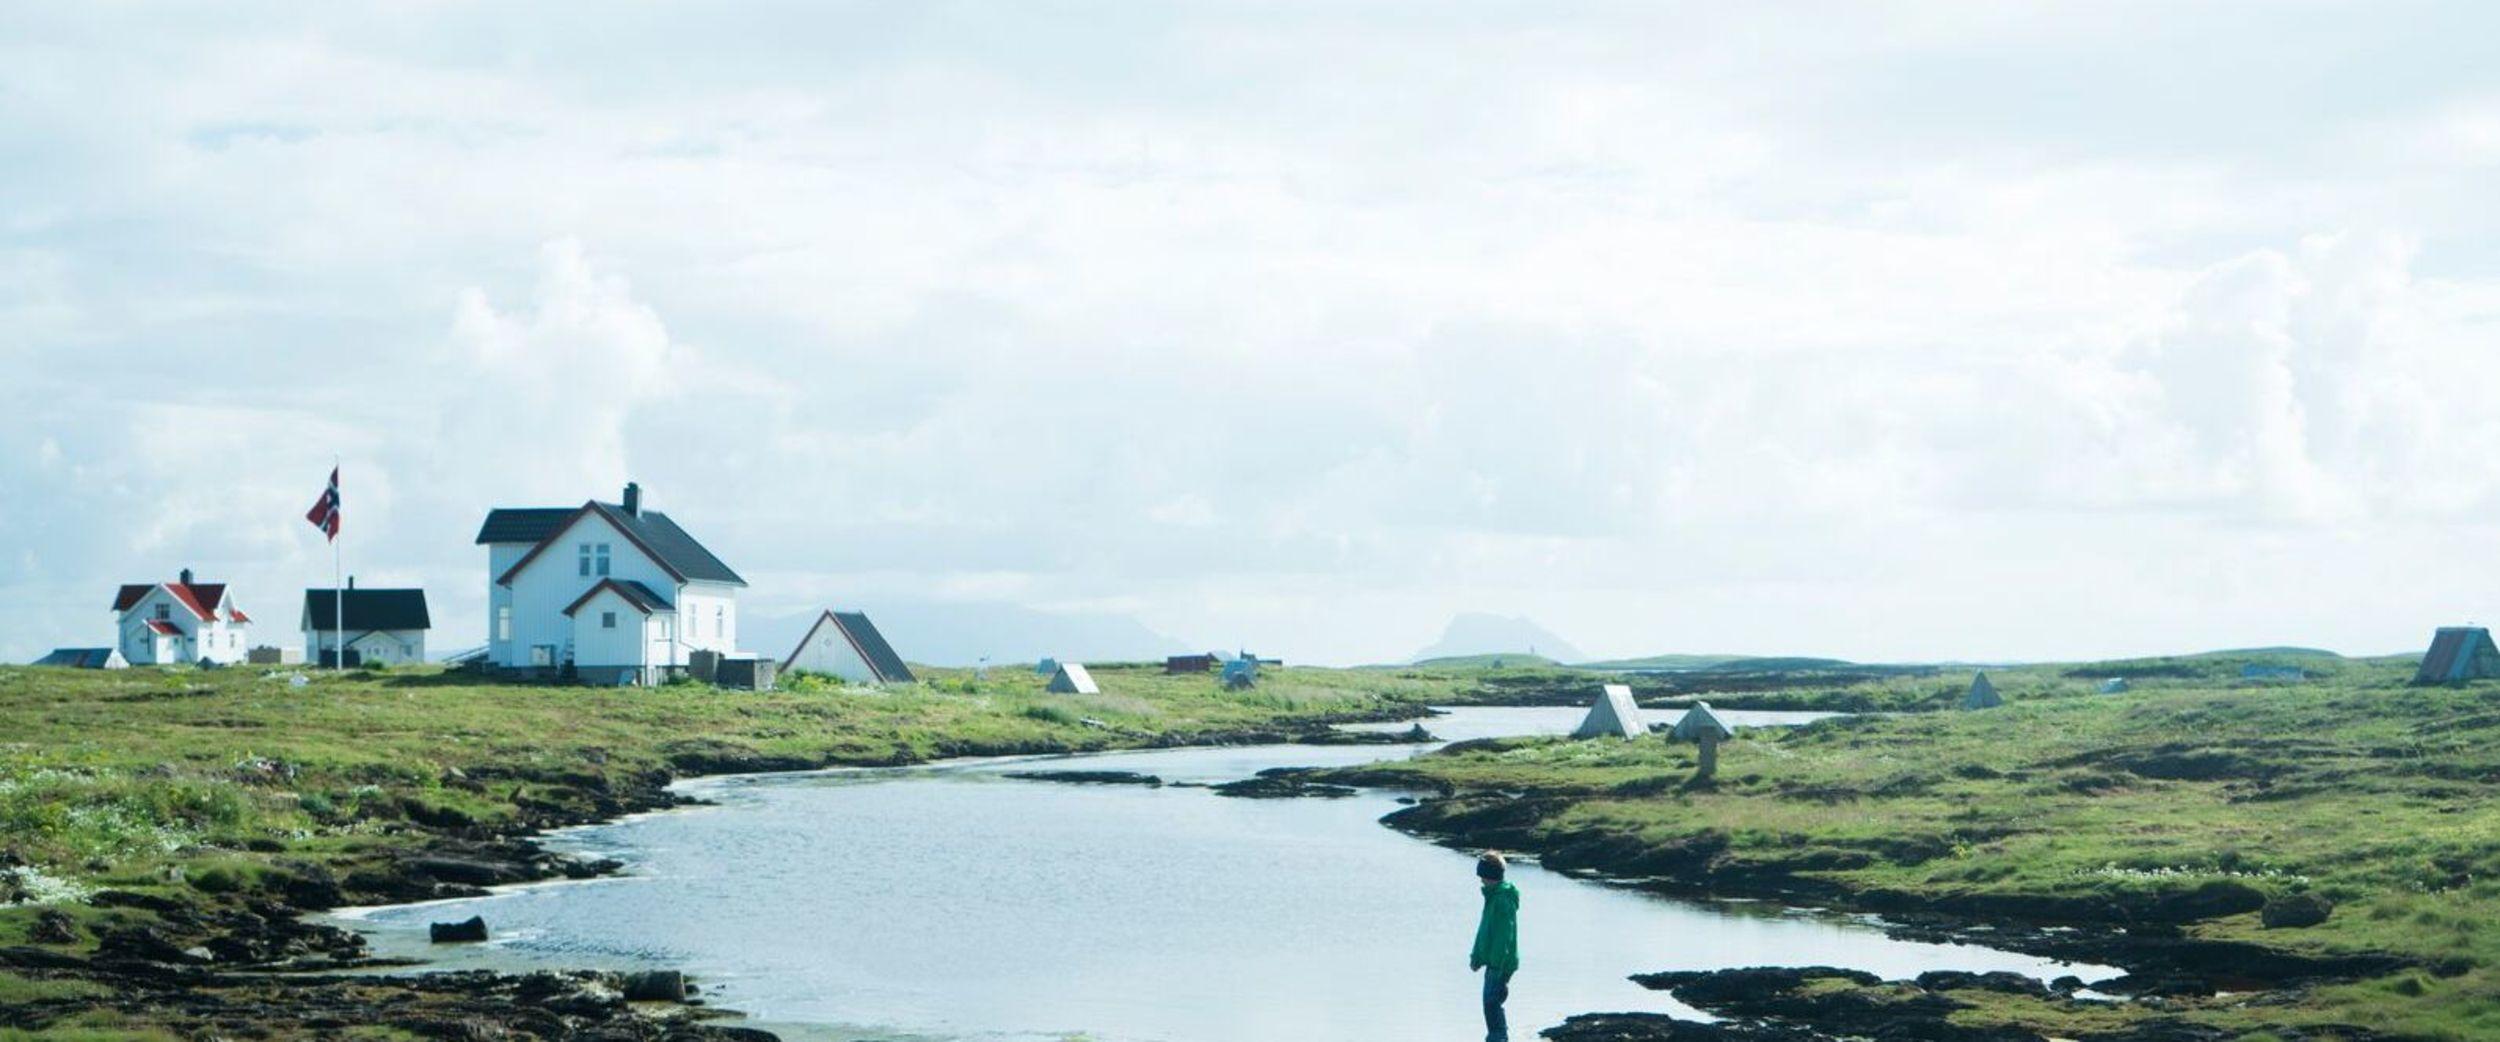 Vega landscape with small houses for eider ducks. Photo: Anton Ligaarden, visitnorway.com